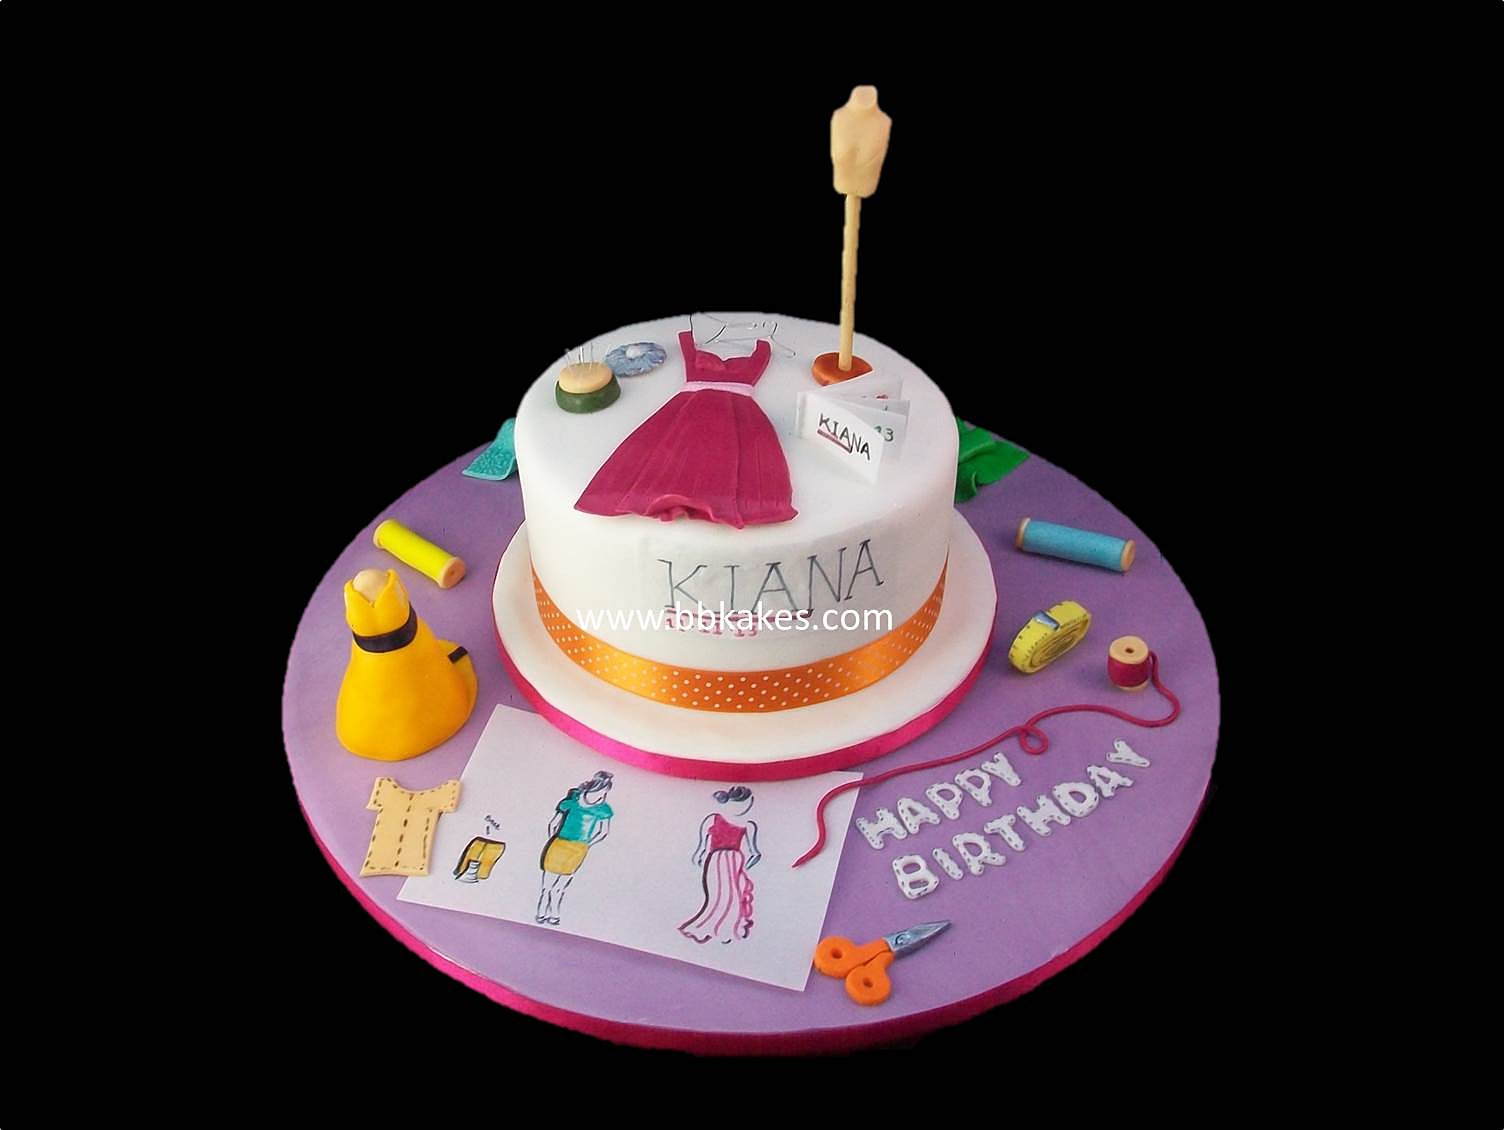 Designer Cakes Of London